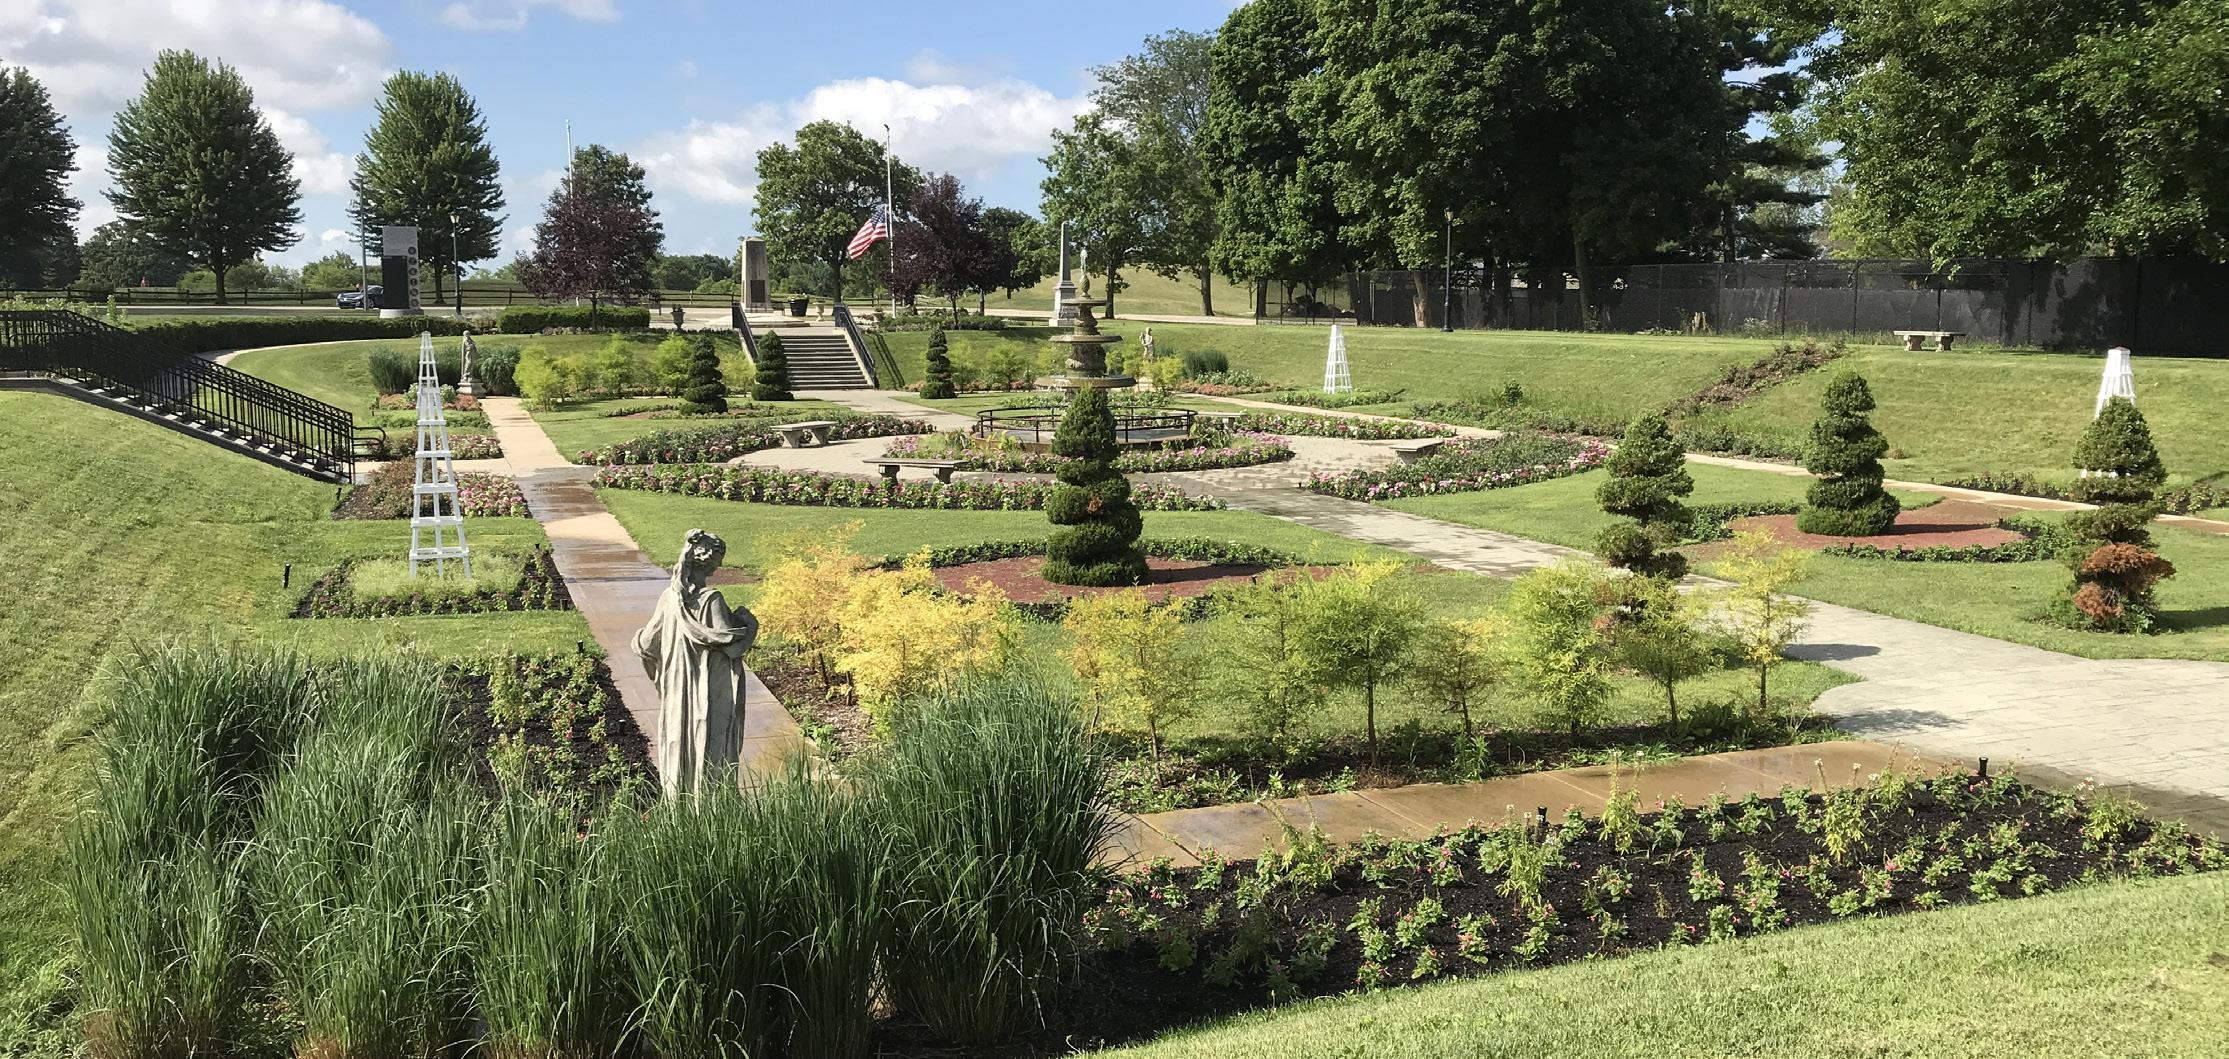 Page 62 of Hidden Landscape Gems The Sunken Garden at Phillips Park